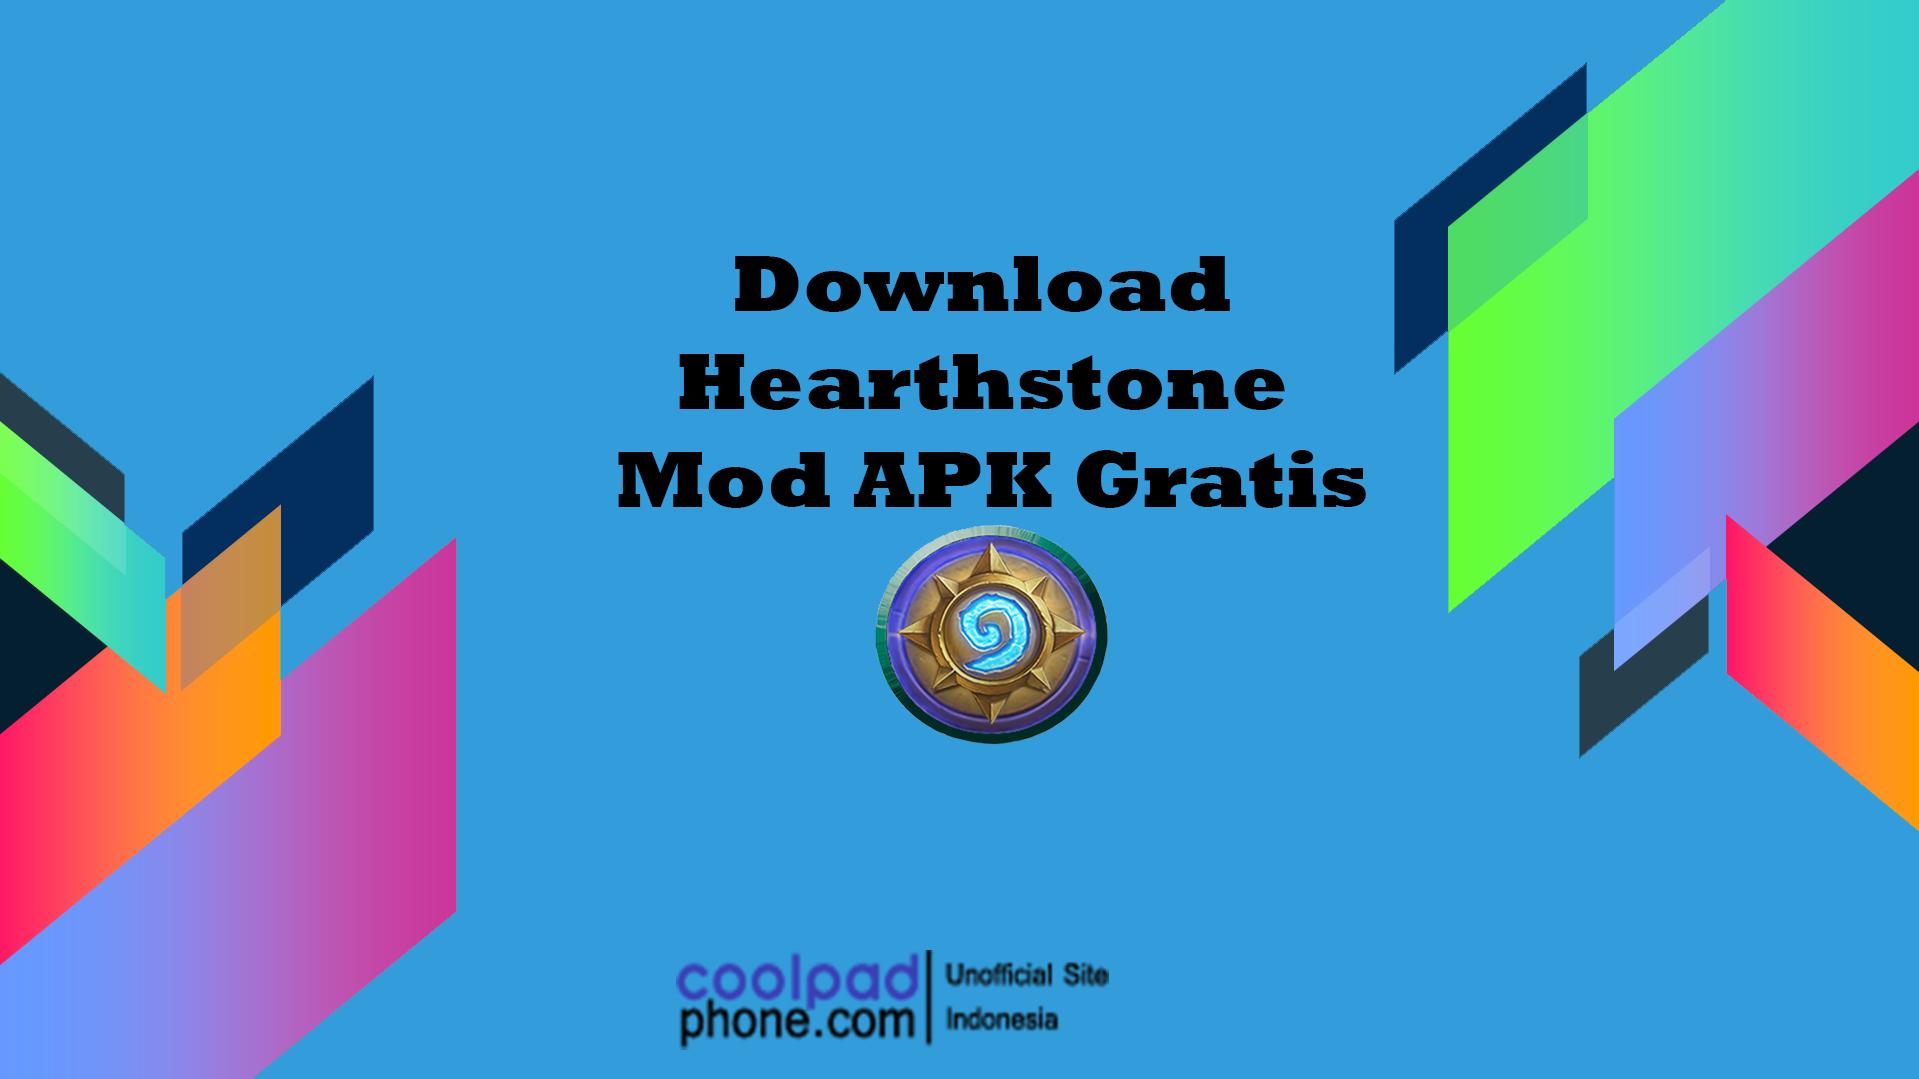 Download Hearthstone Mod APK Gratis